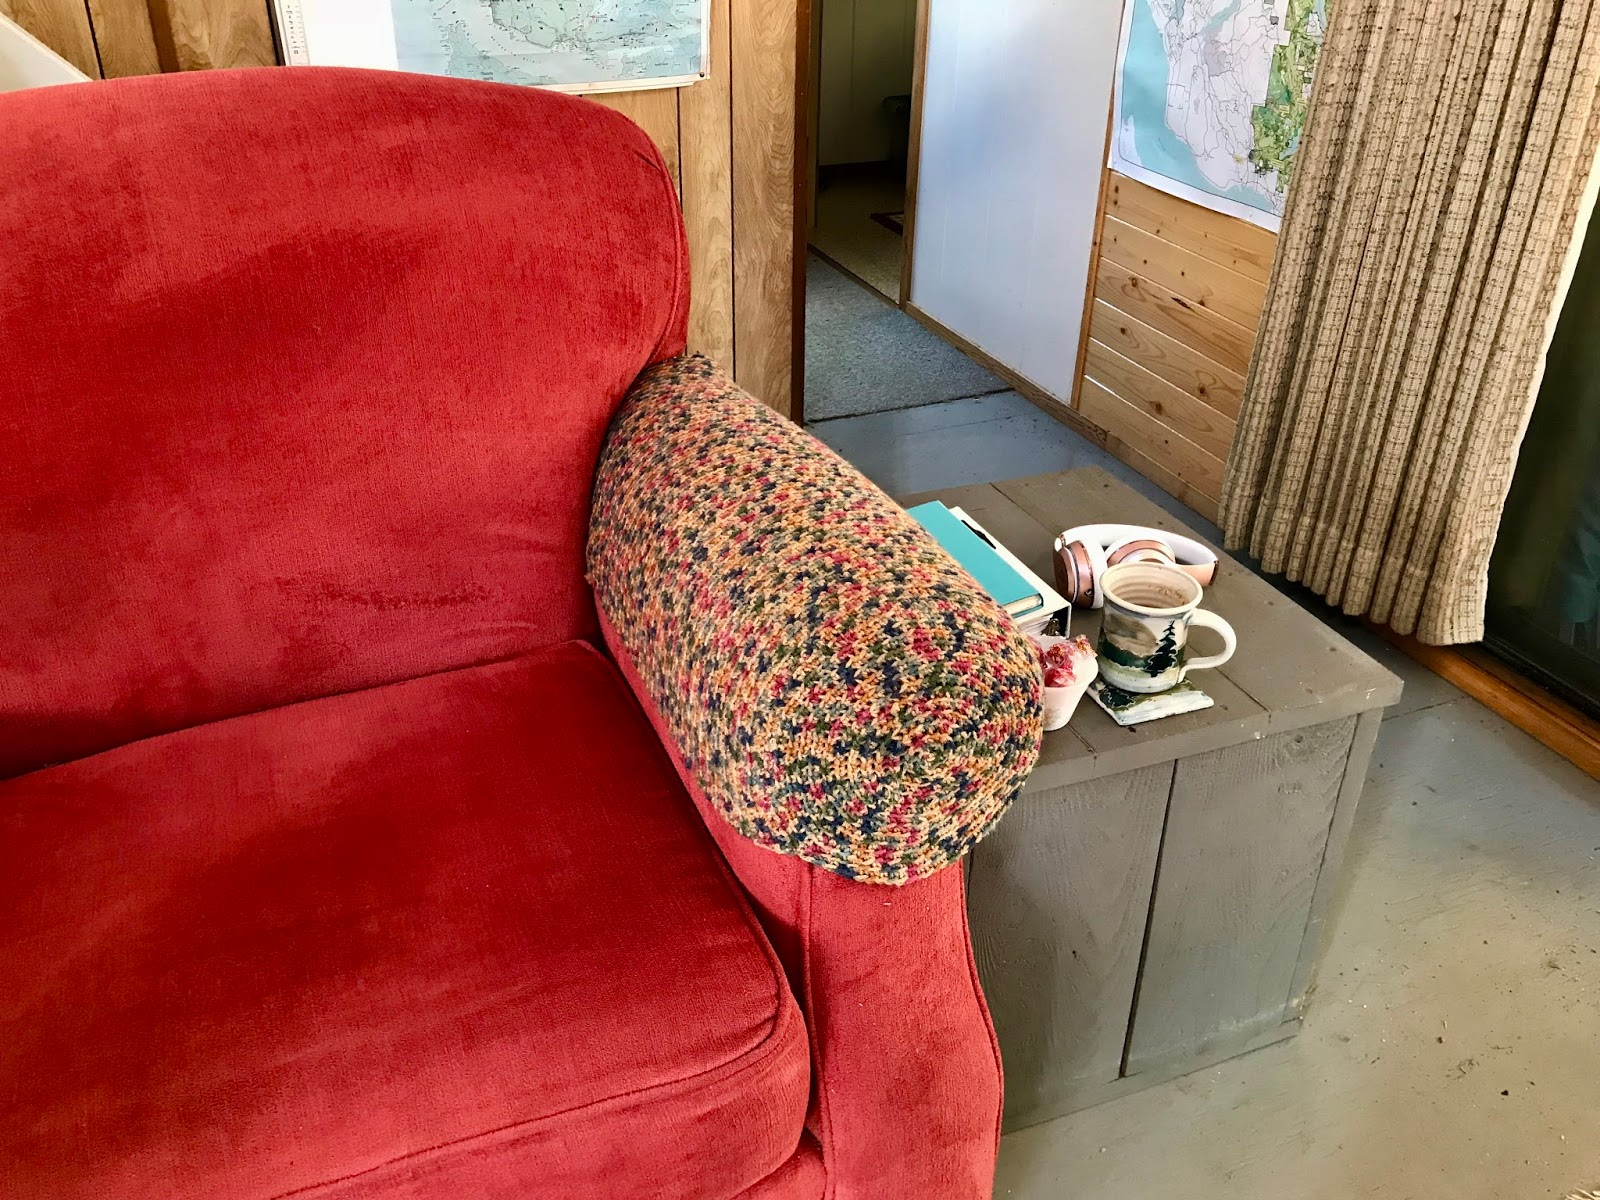 Swell Powell River Books Blog Crochet Sofa Armrest Covers Uwap Interior Chair Design Uwaporg